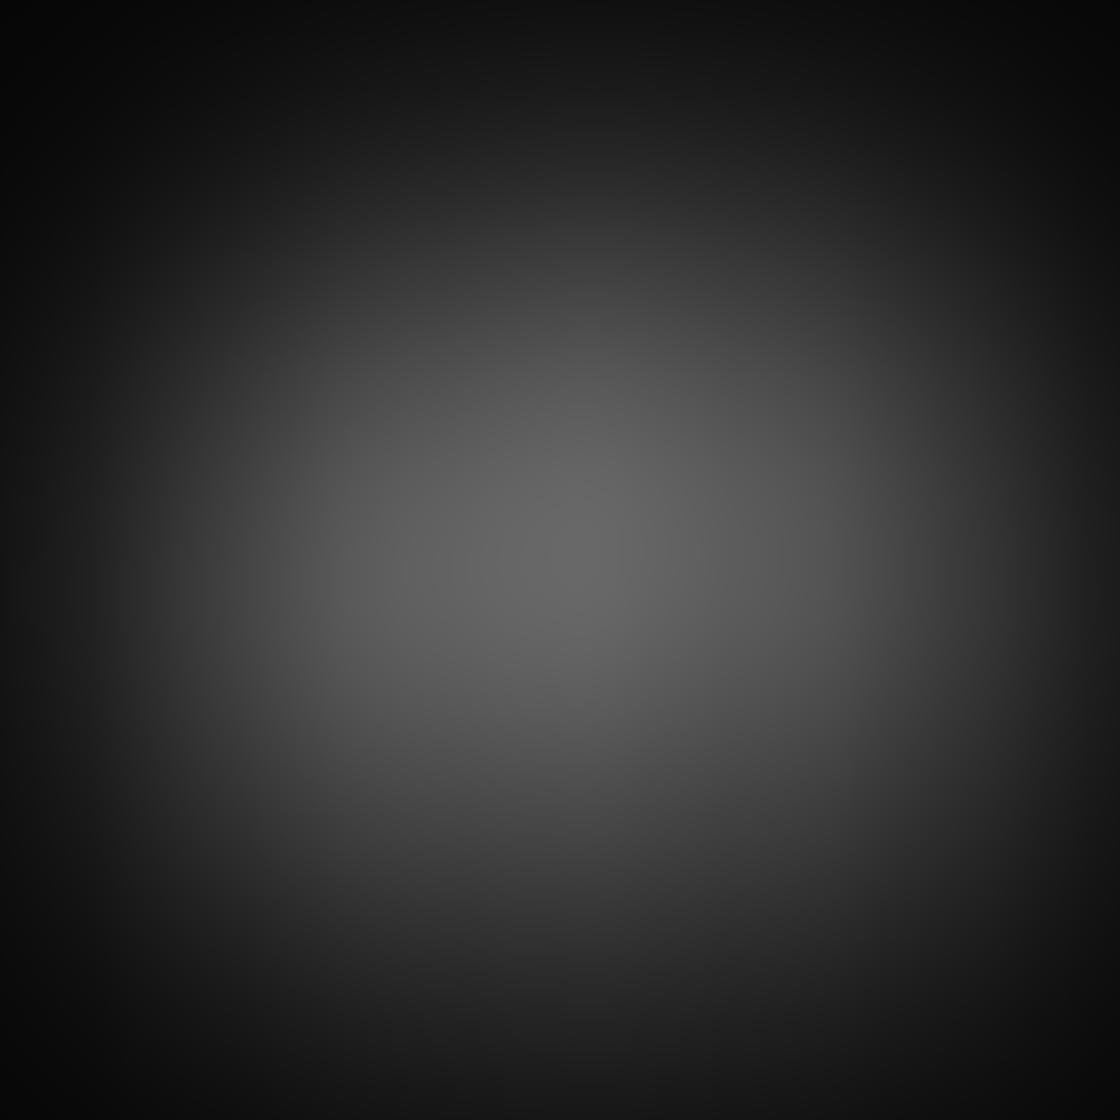 iPhone Photos Black White 8